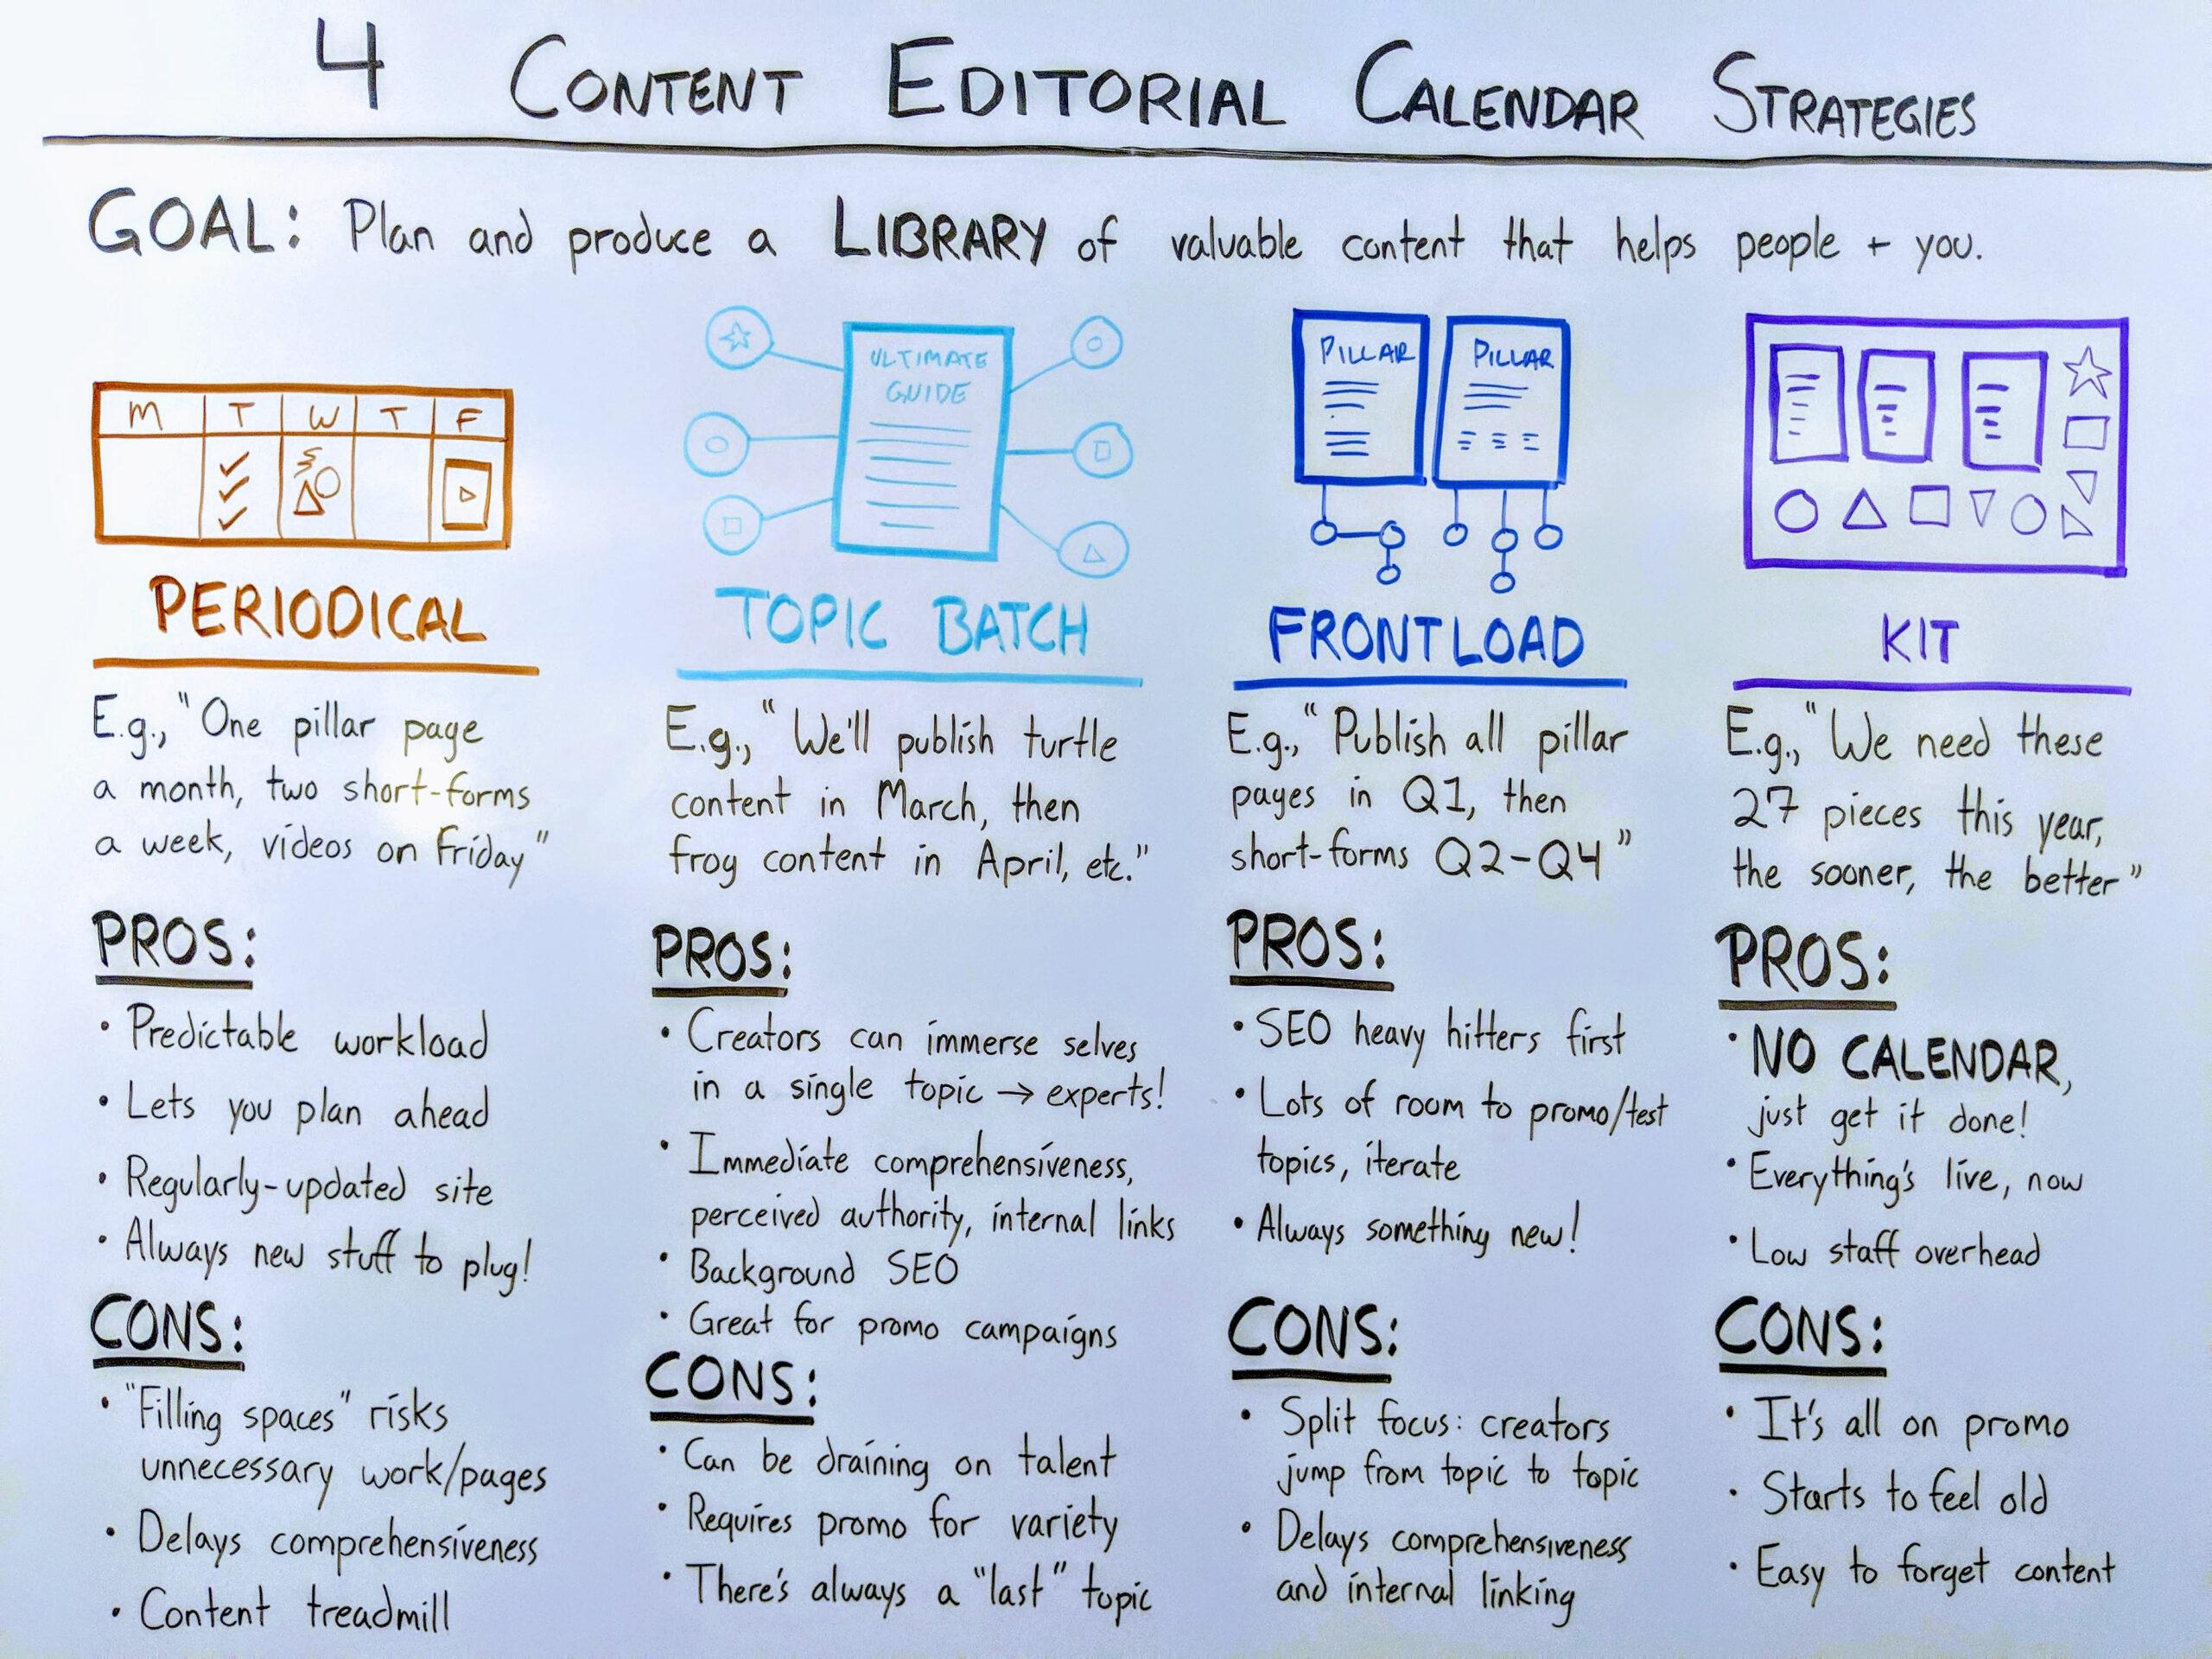 4 (Reasonable) Ways To Make A Content Calendar